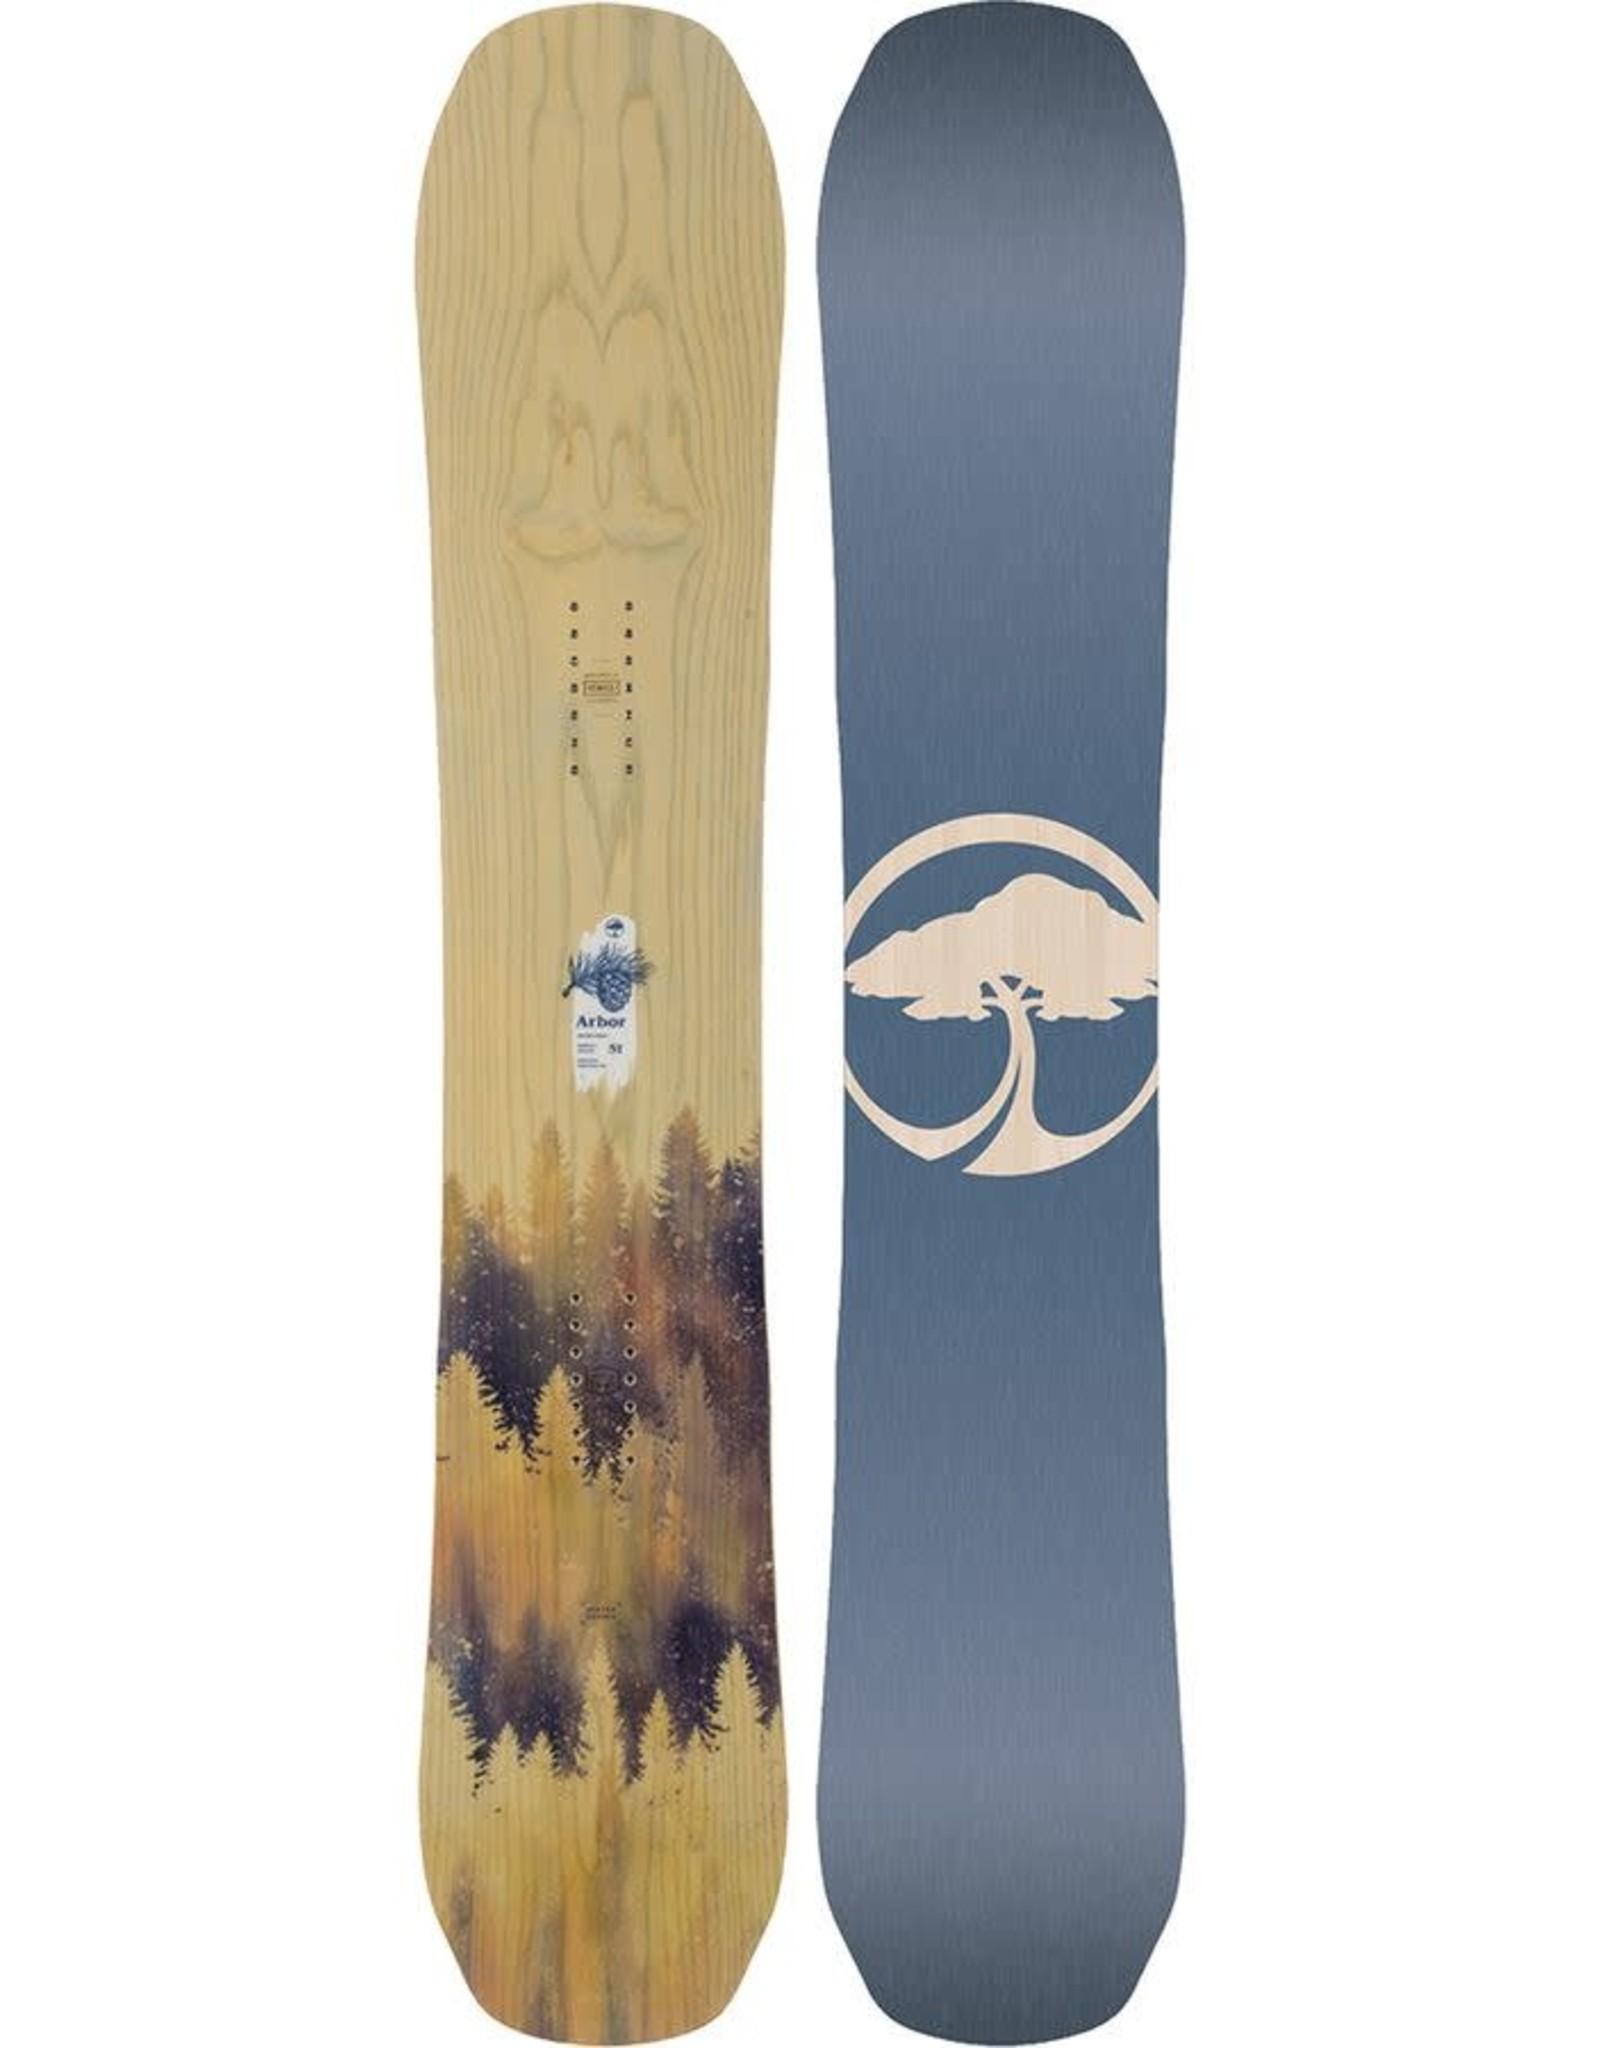 ARBOR ARBOR 2020 SWOON CAMBER SNOWBOARD